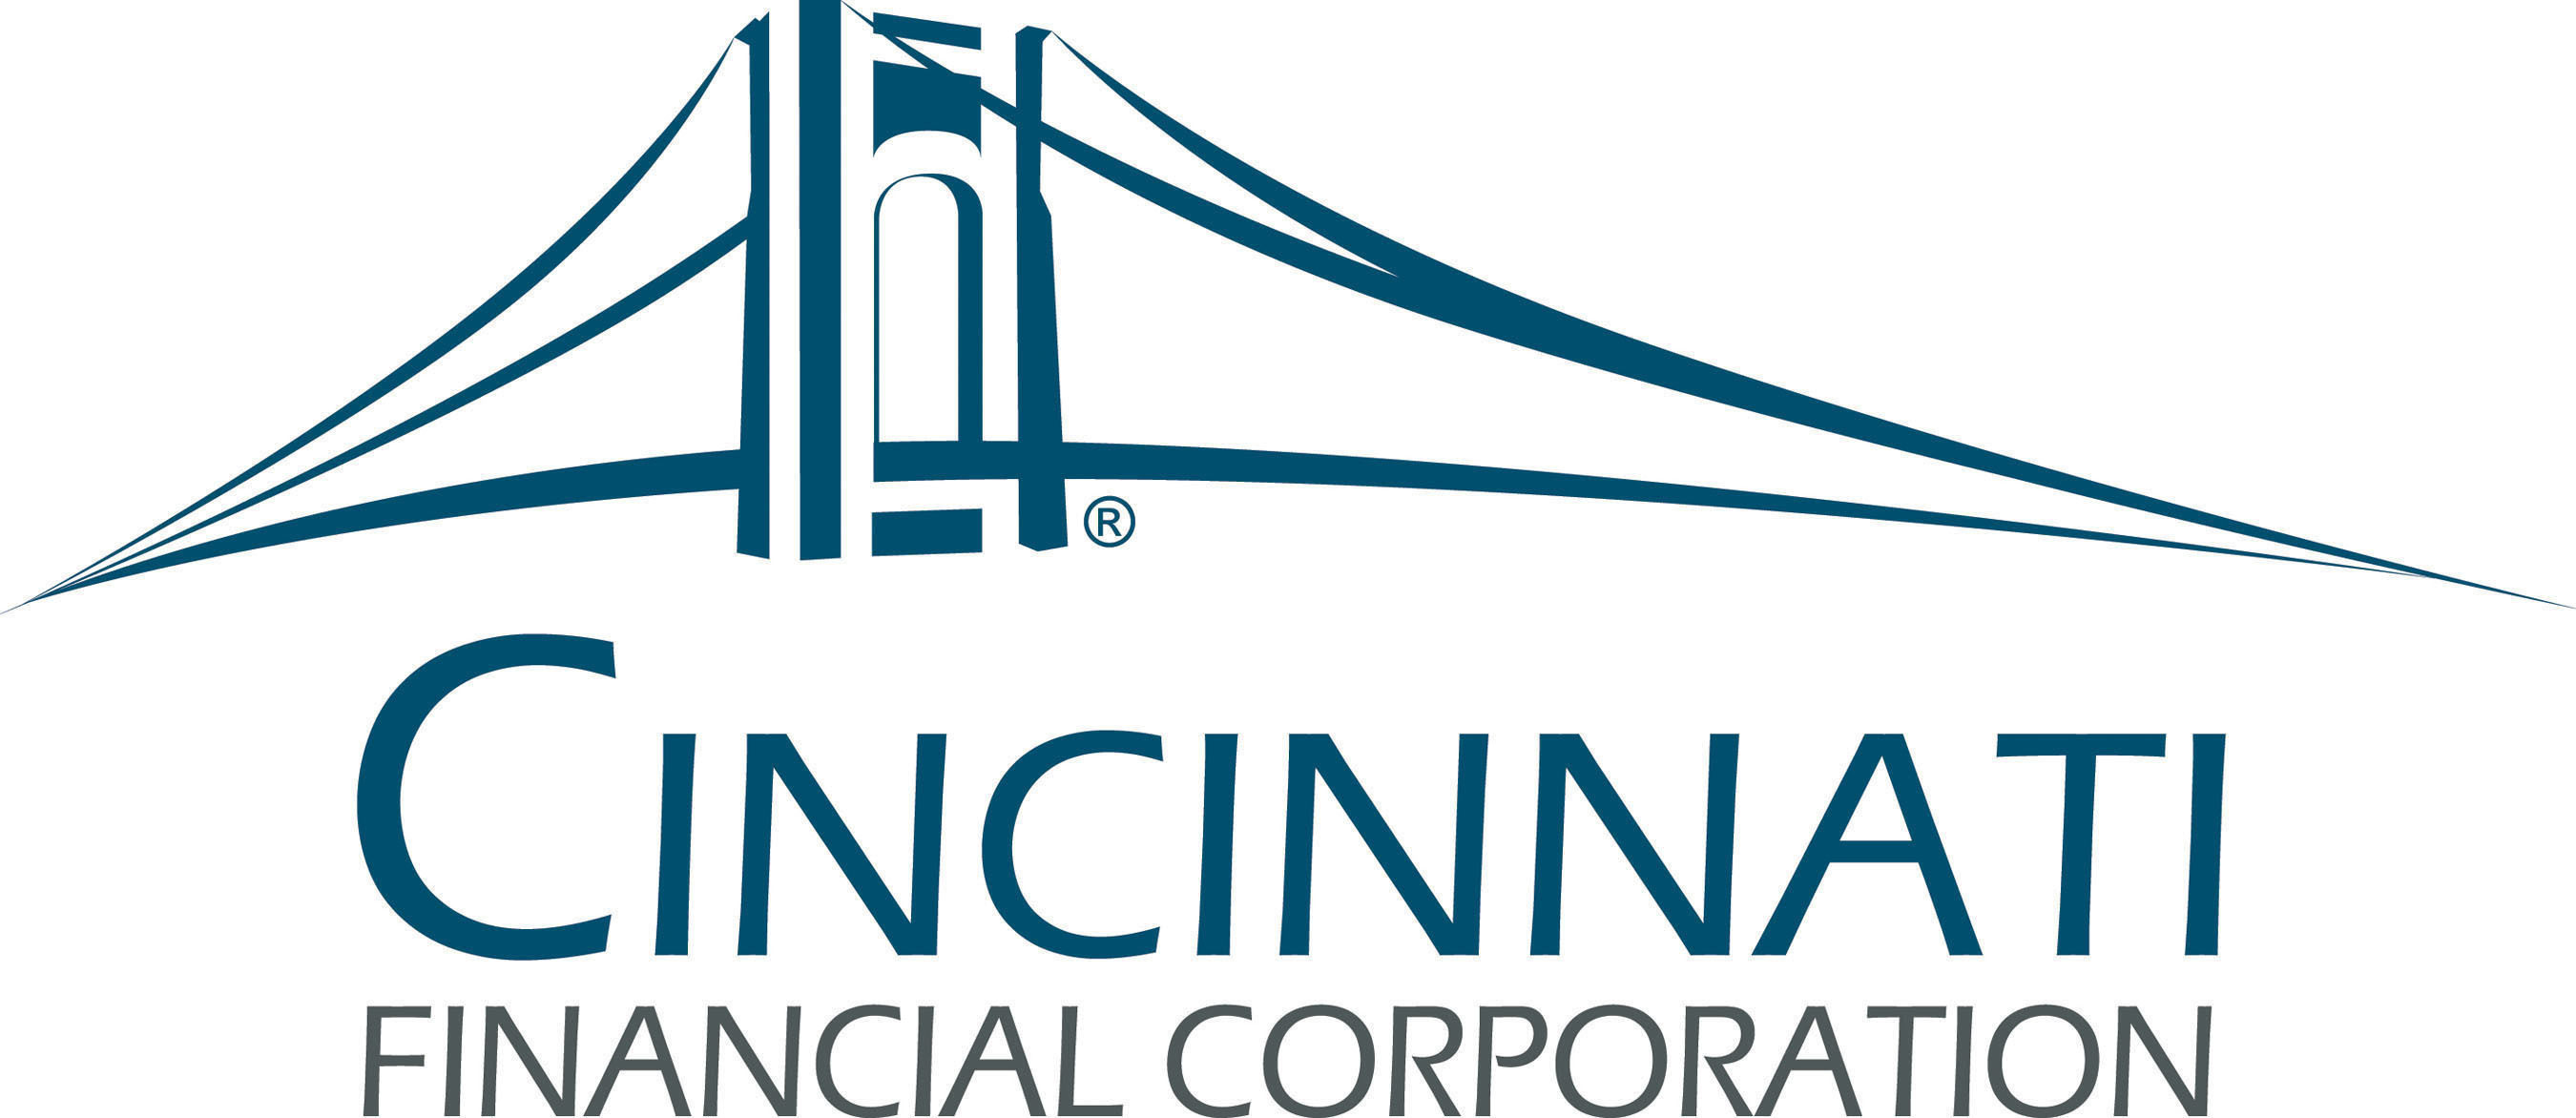 Cincinnati Financial Corporation logo. (PRNewsFoto/Cincinnati Financial Corporation)